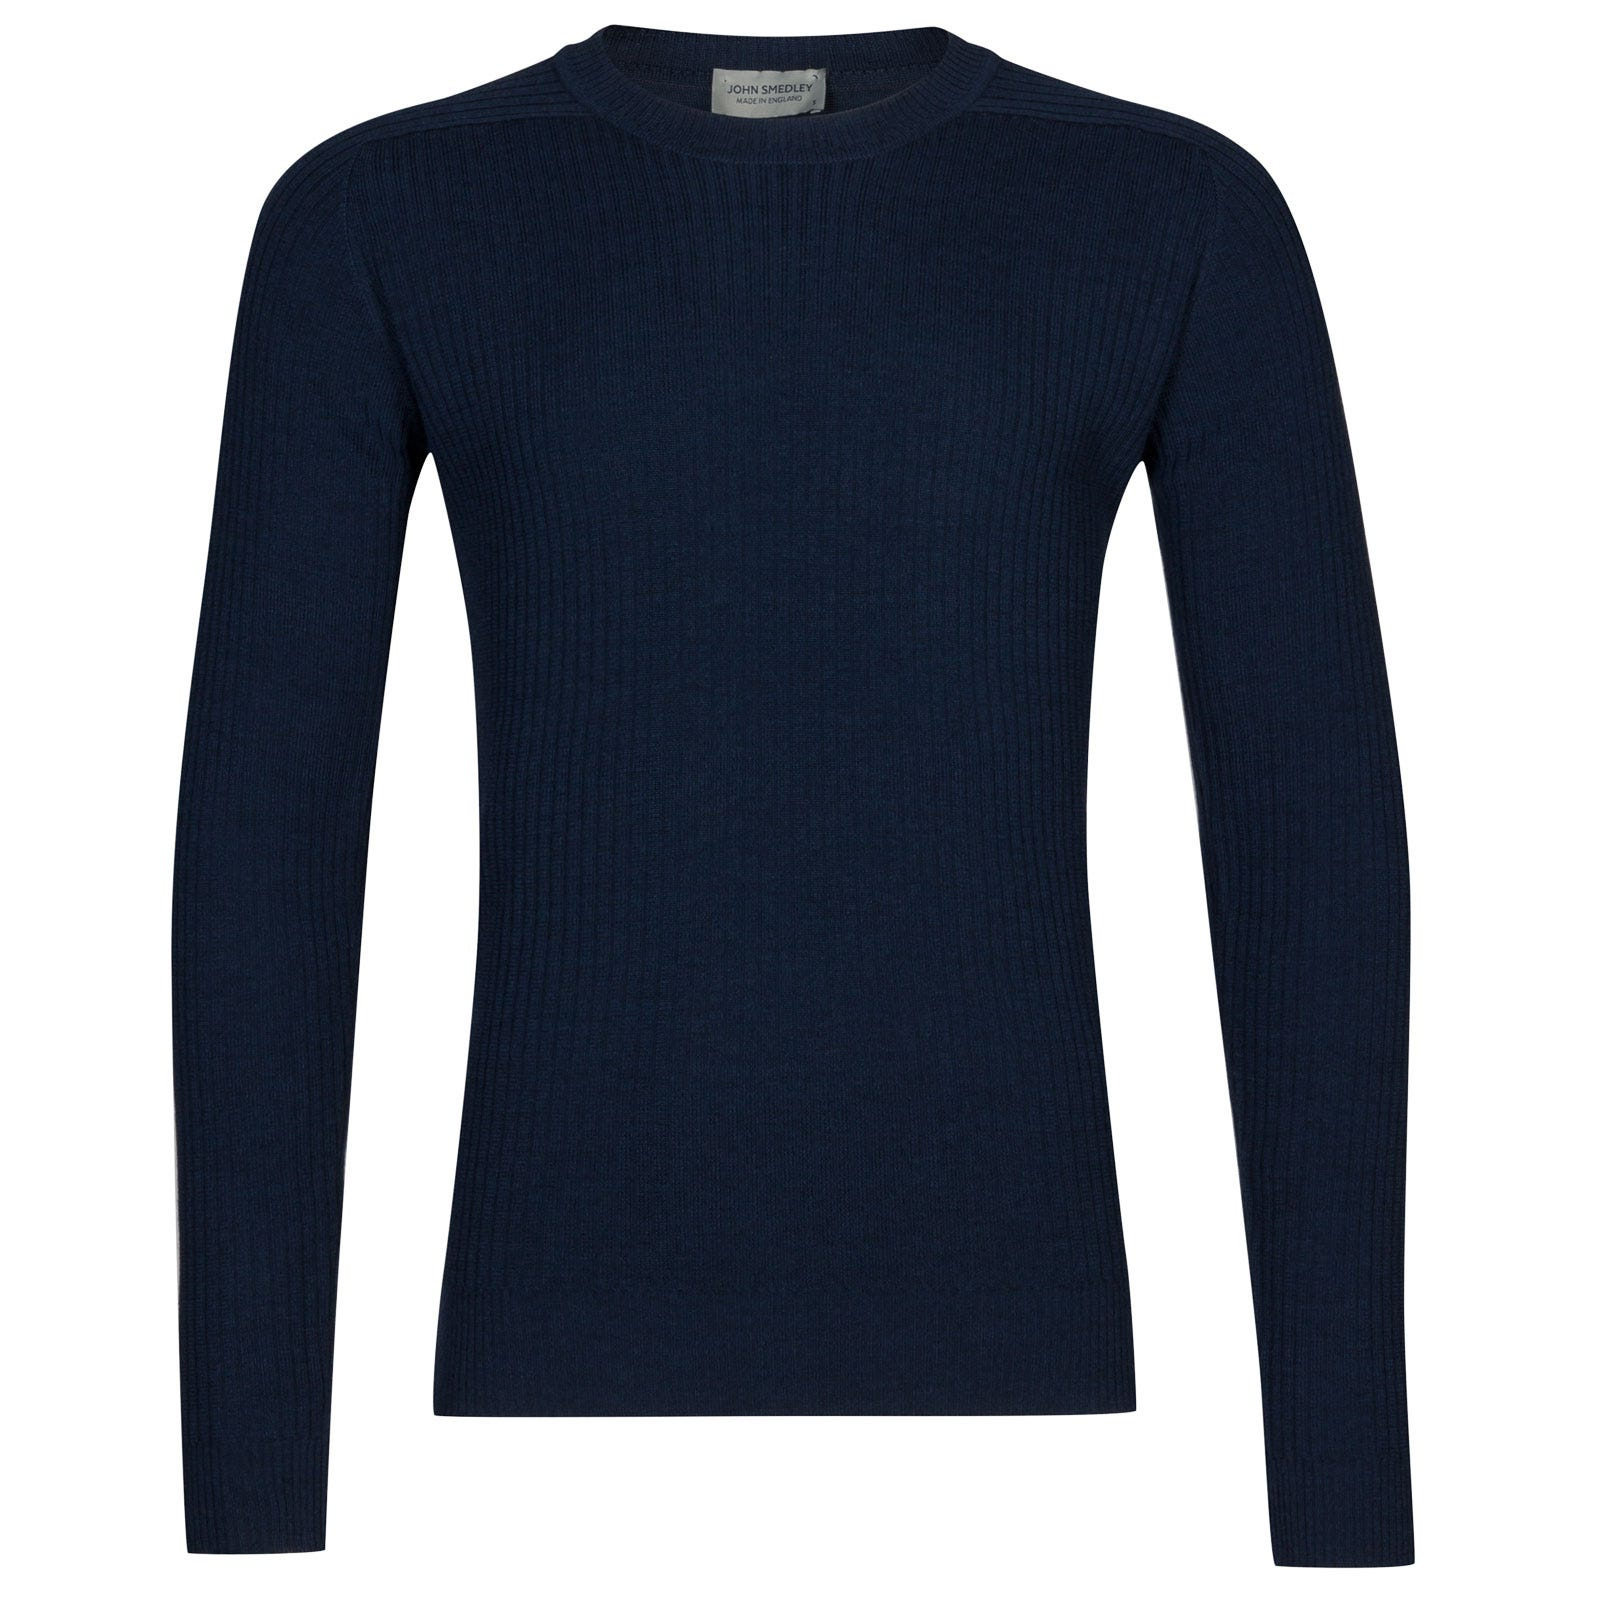 John Smedley idris Merino Wool Pullover in Indigo-L